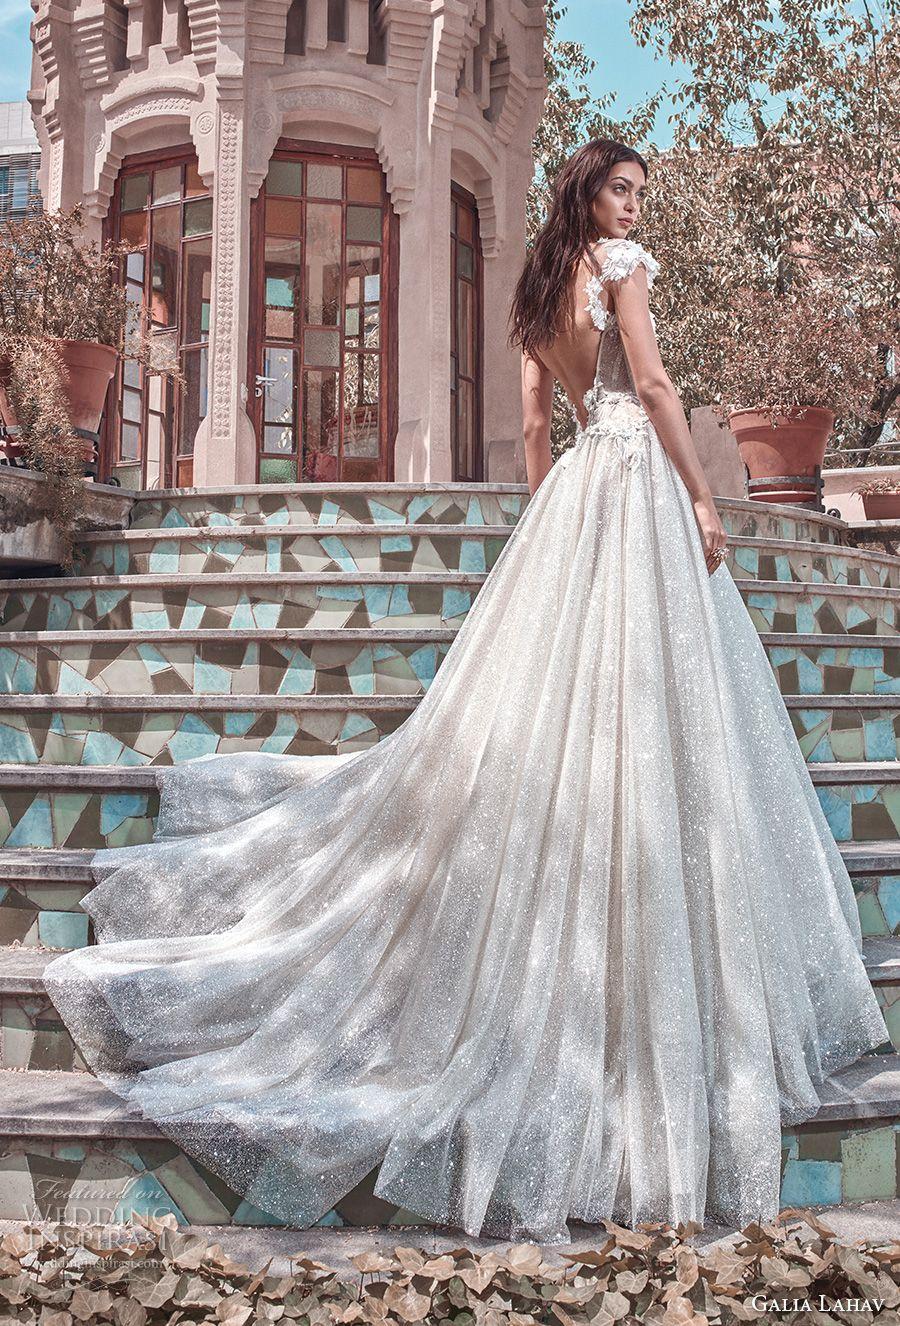 Galia lahav spring wedding dresses u ucvictorian affinity